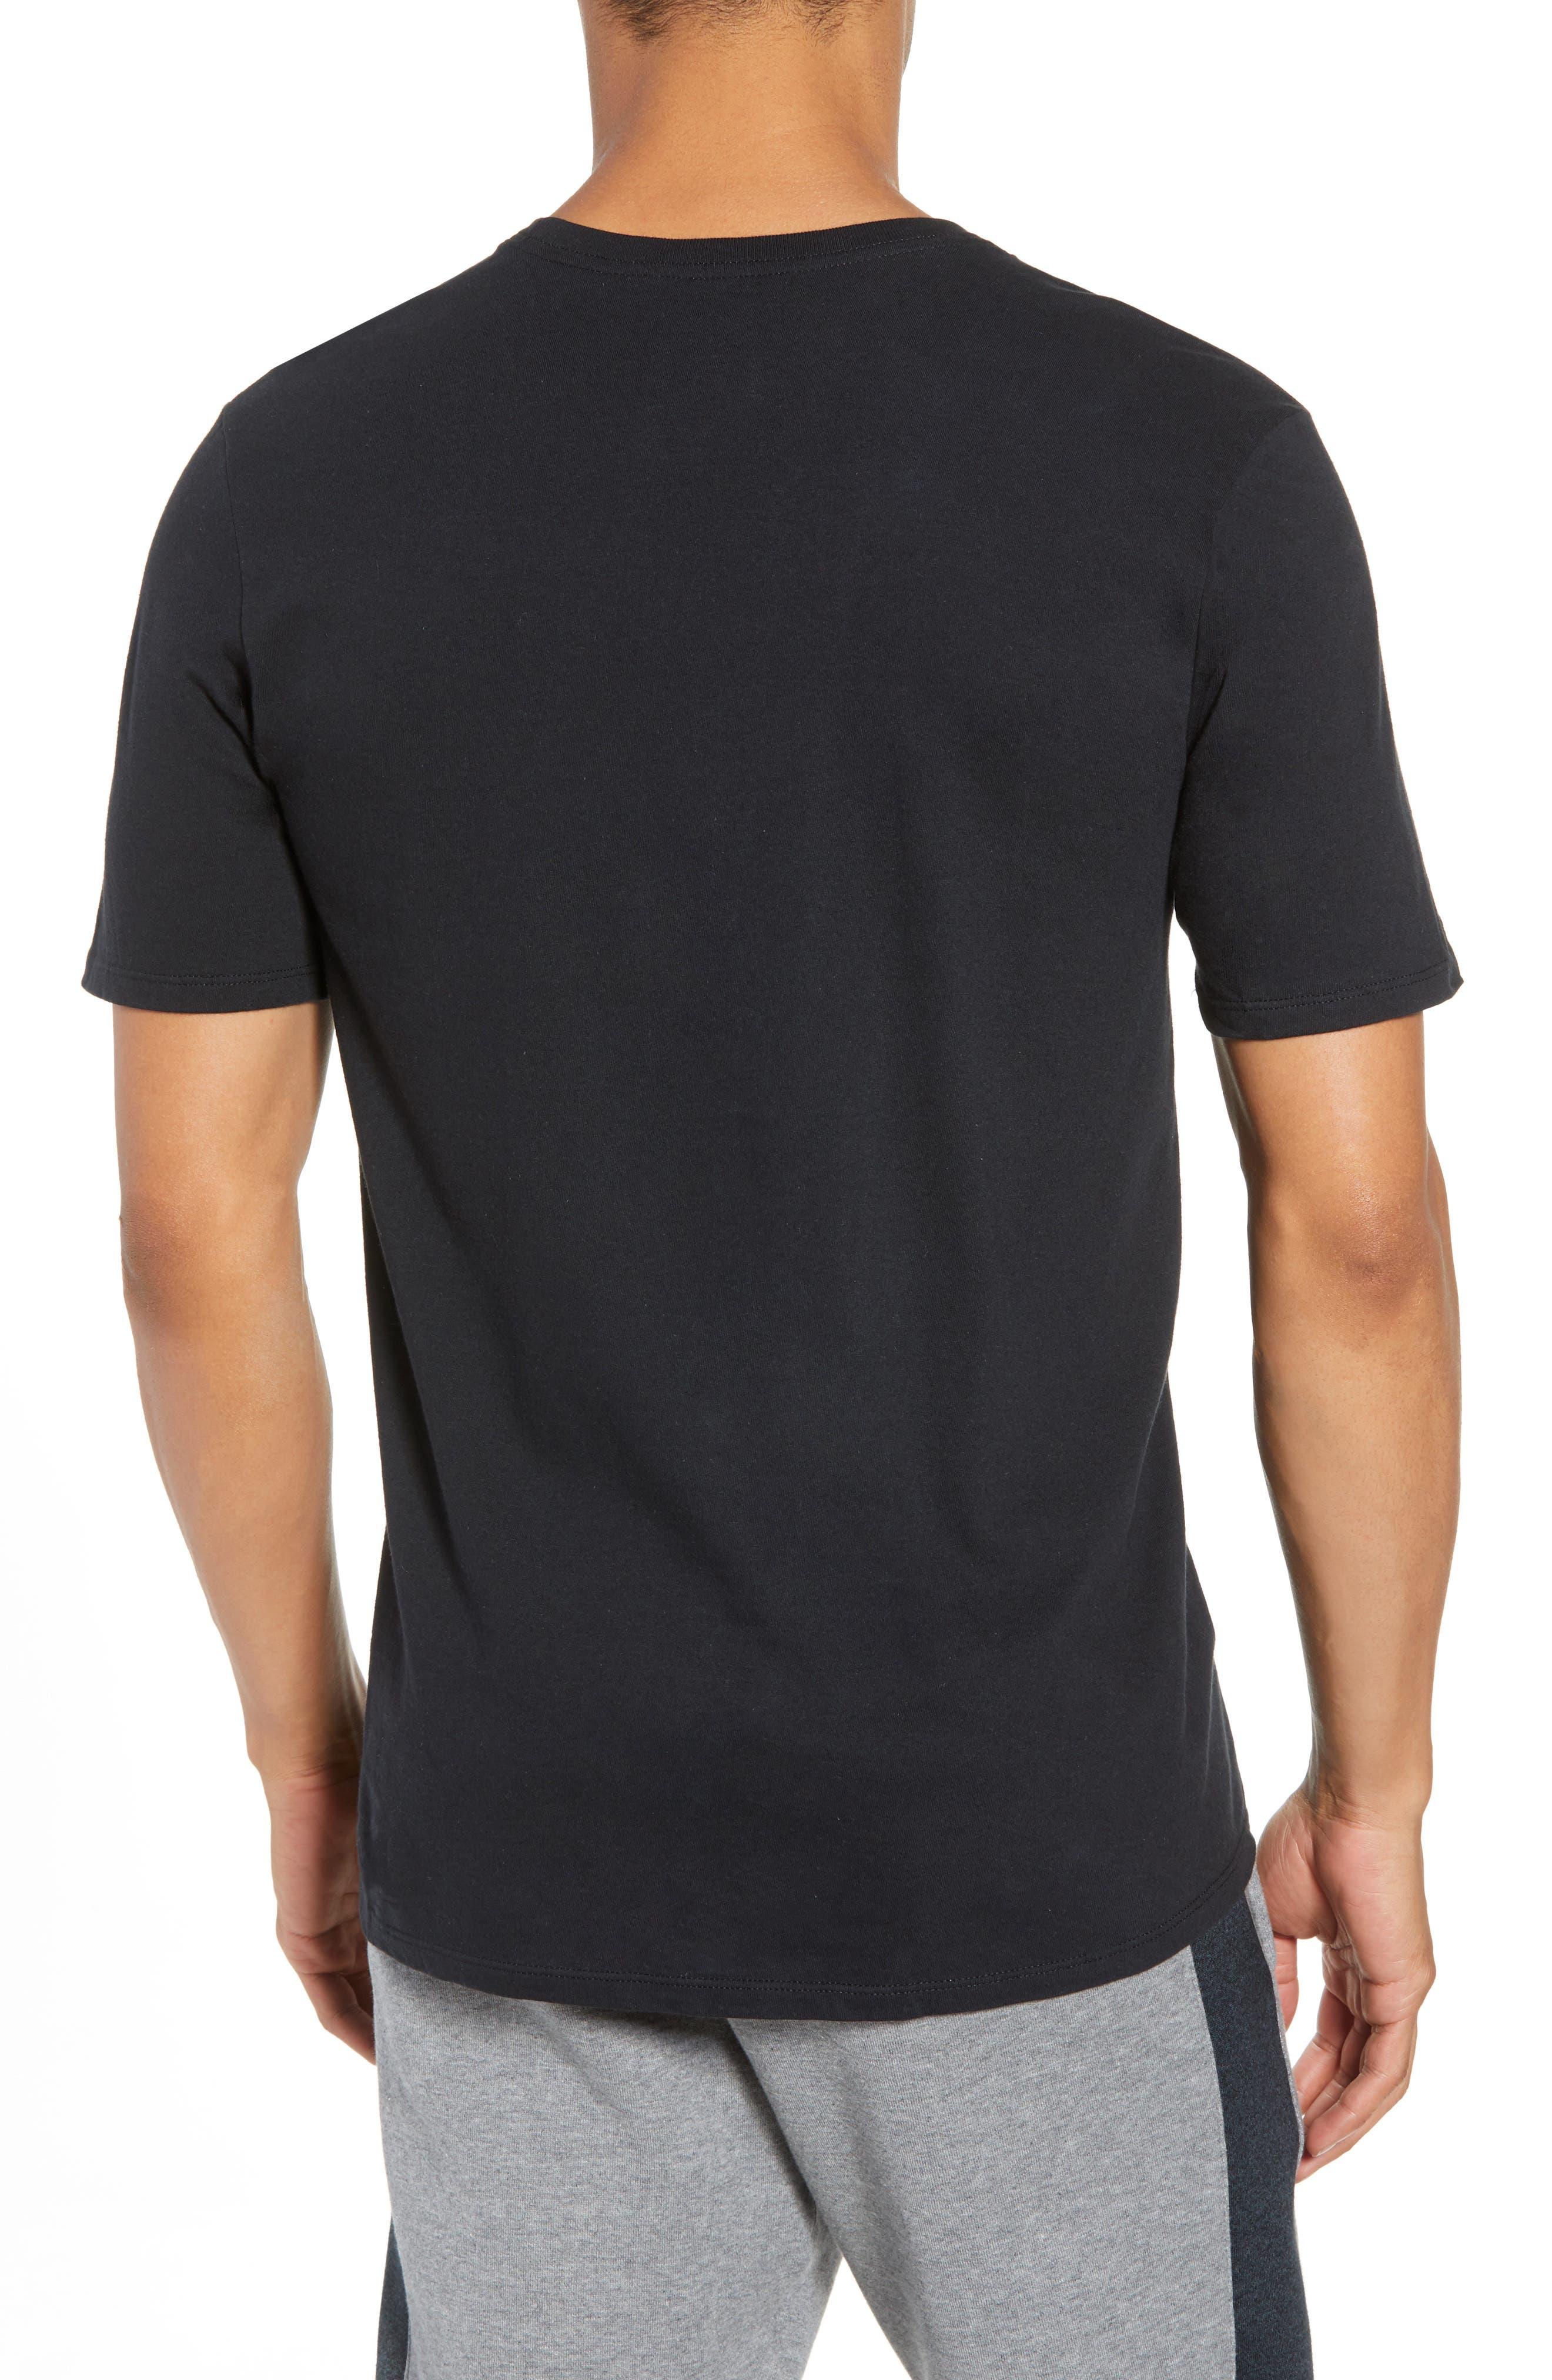 NIKE,                             Sportswear More Money T-Shirt,                             Alternate thumbnail 2, color,                             010